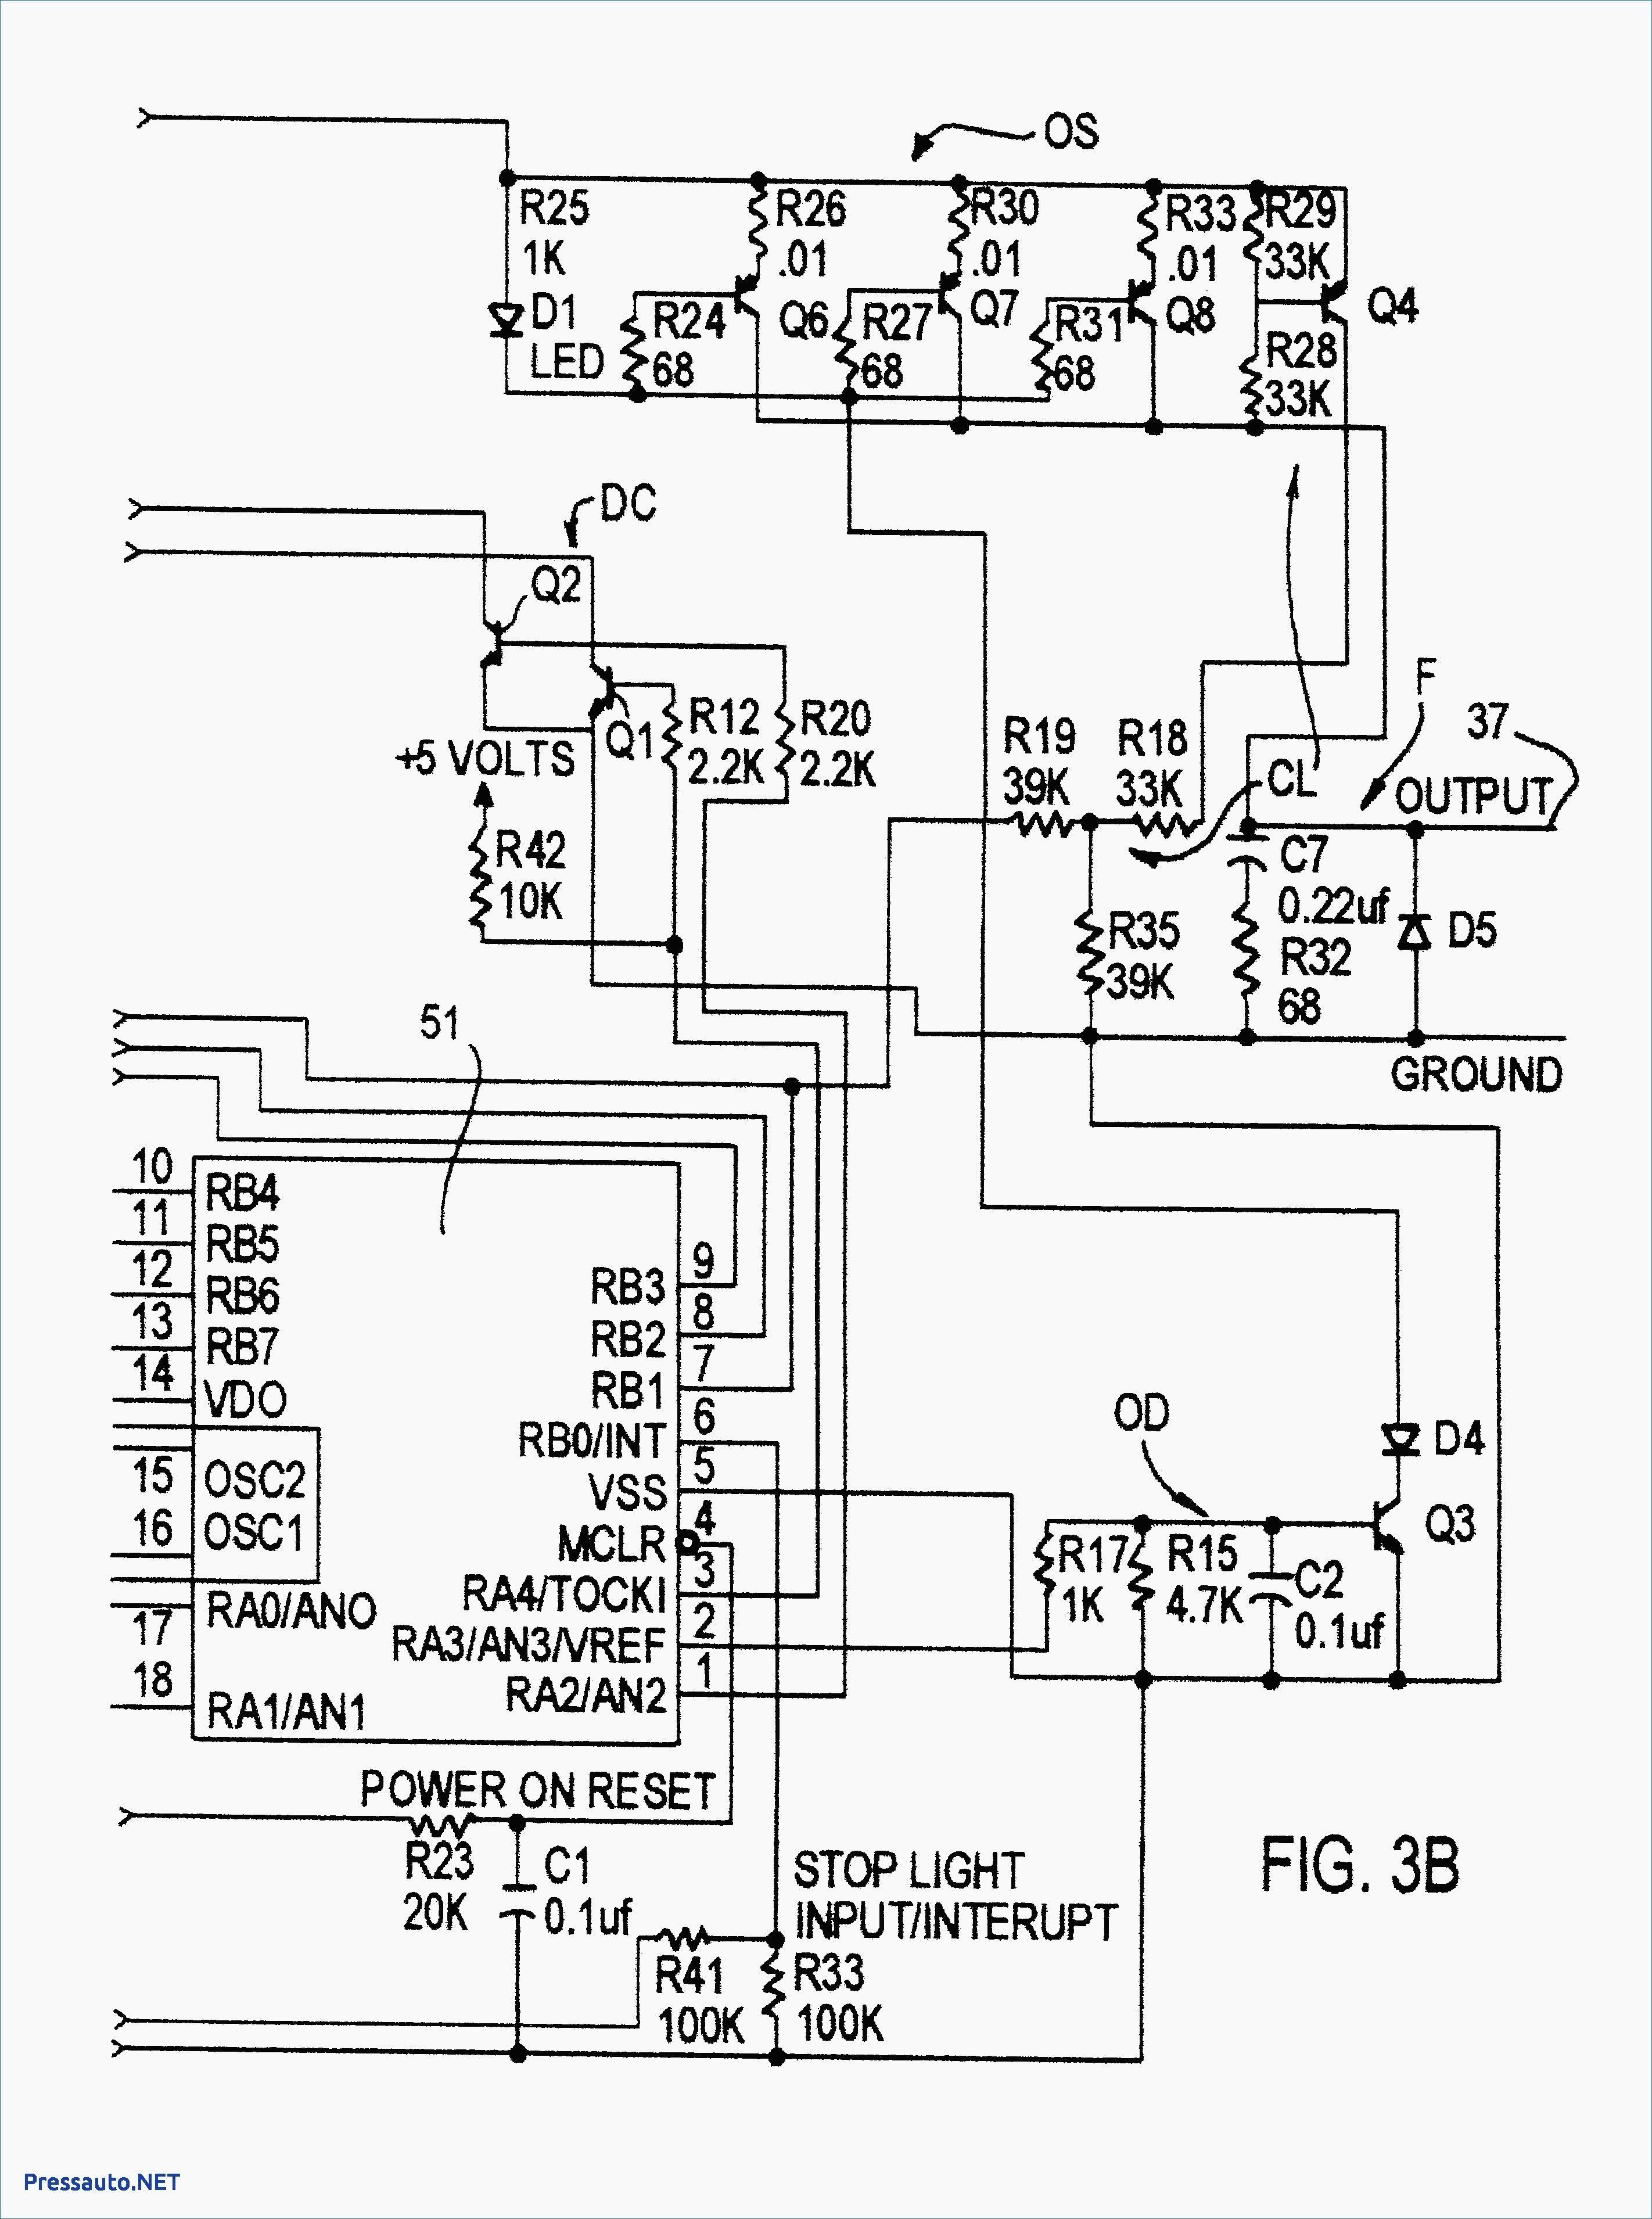 [DIAGRAM] Chevy Silverado Wiring Diagram Brake Controller